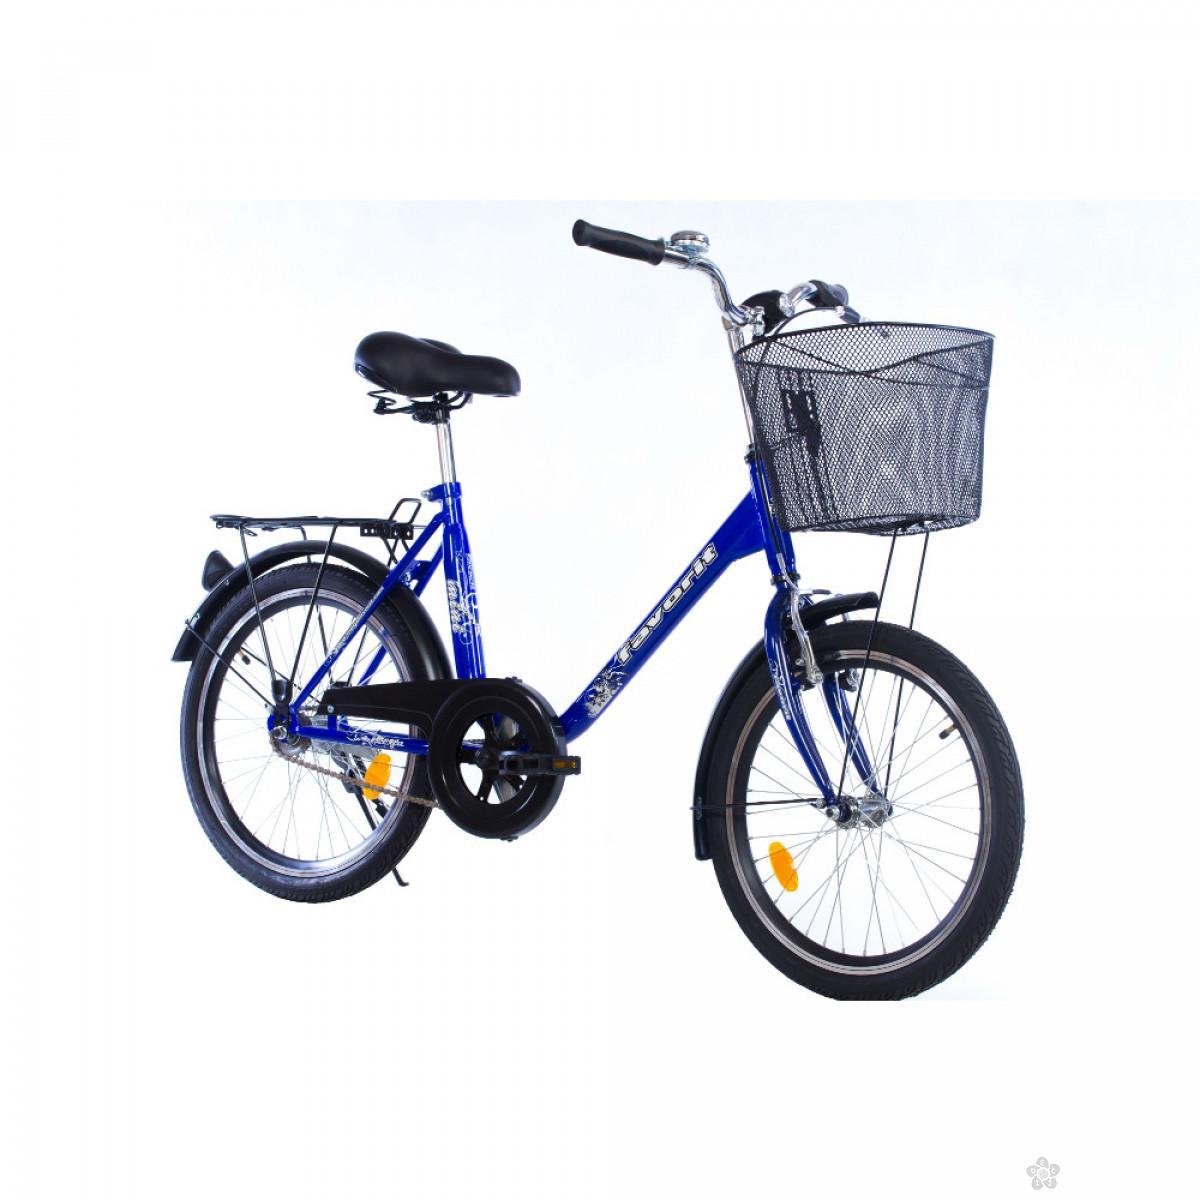 Dečiji Bicikl Mini 20 plava, 460165